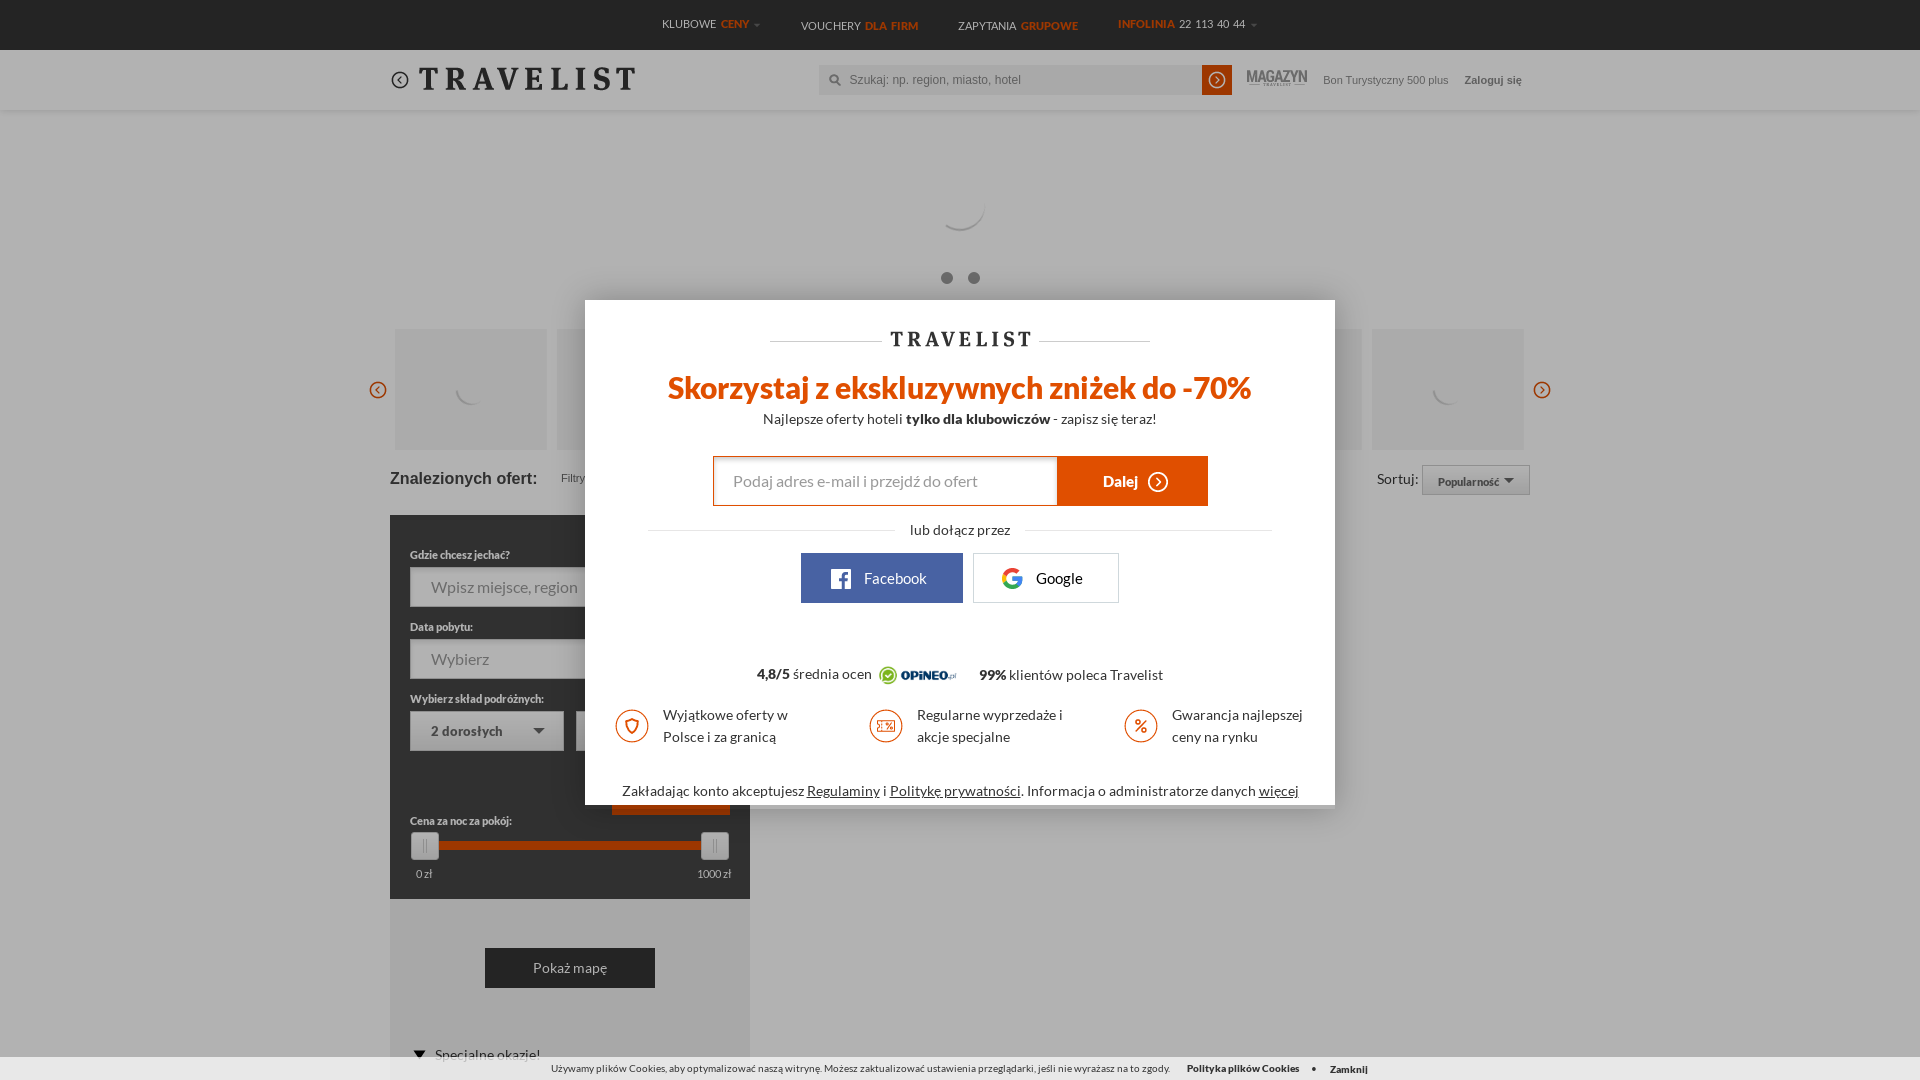 Travelist PL website